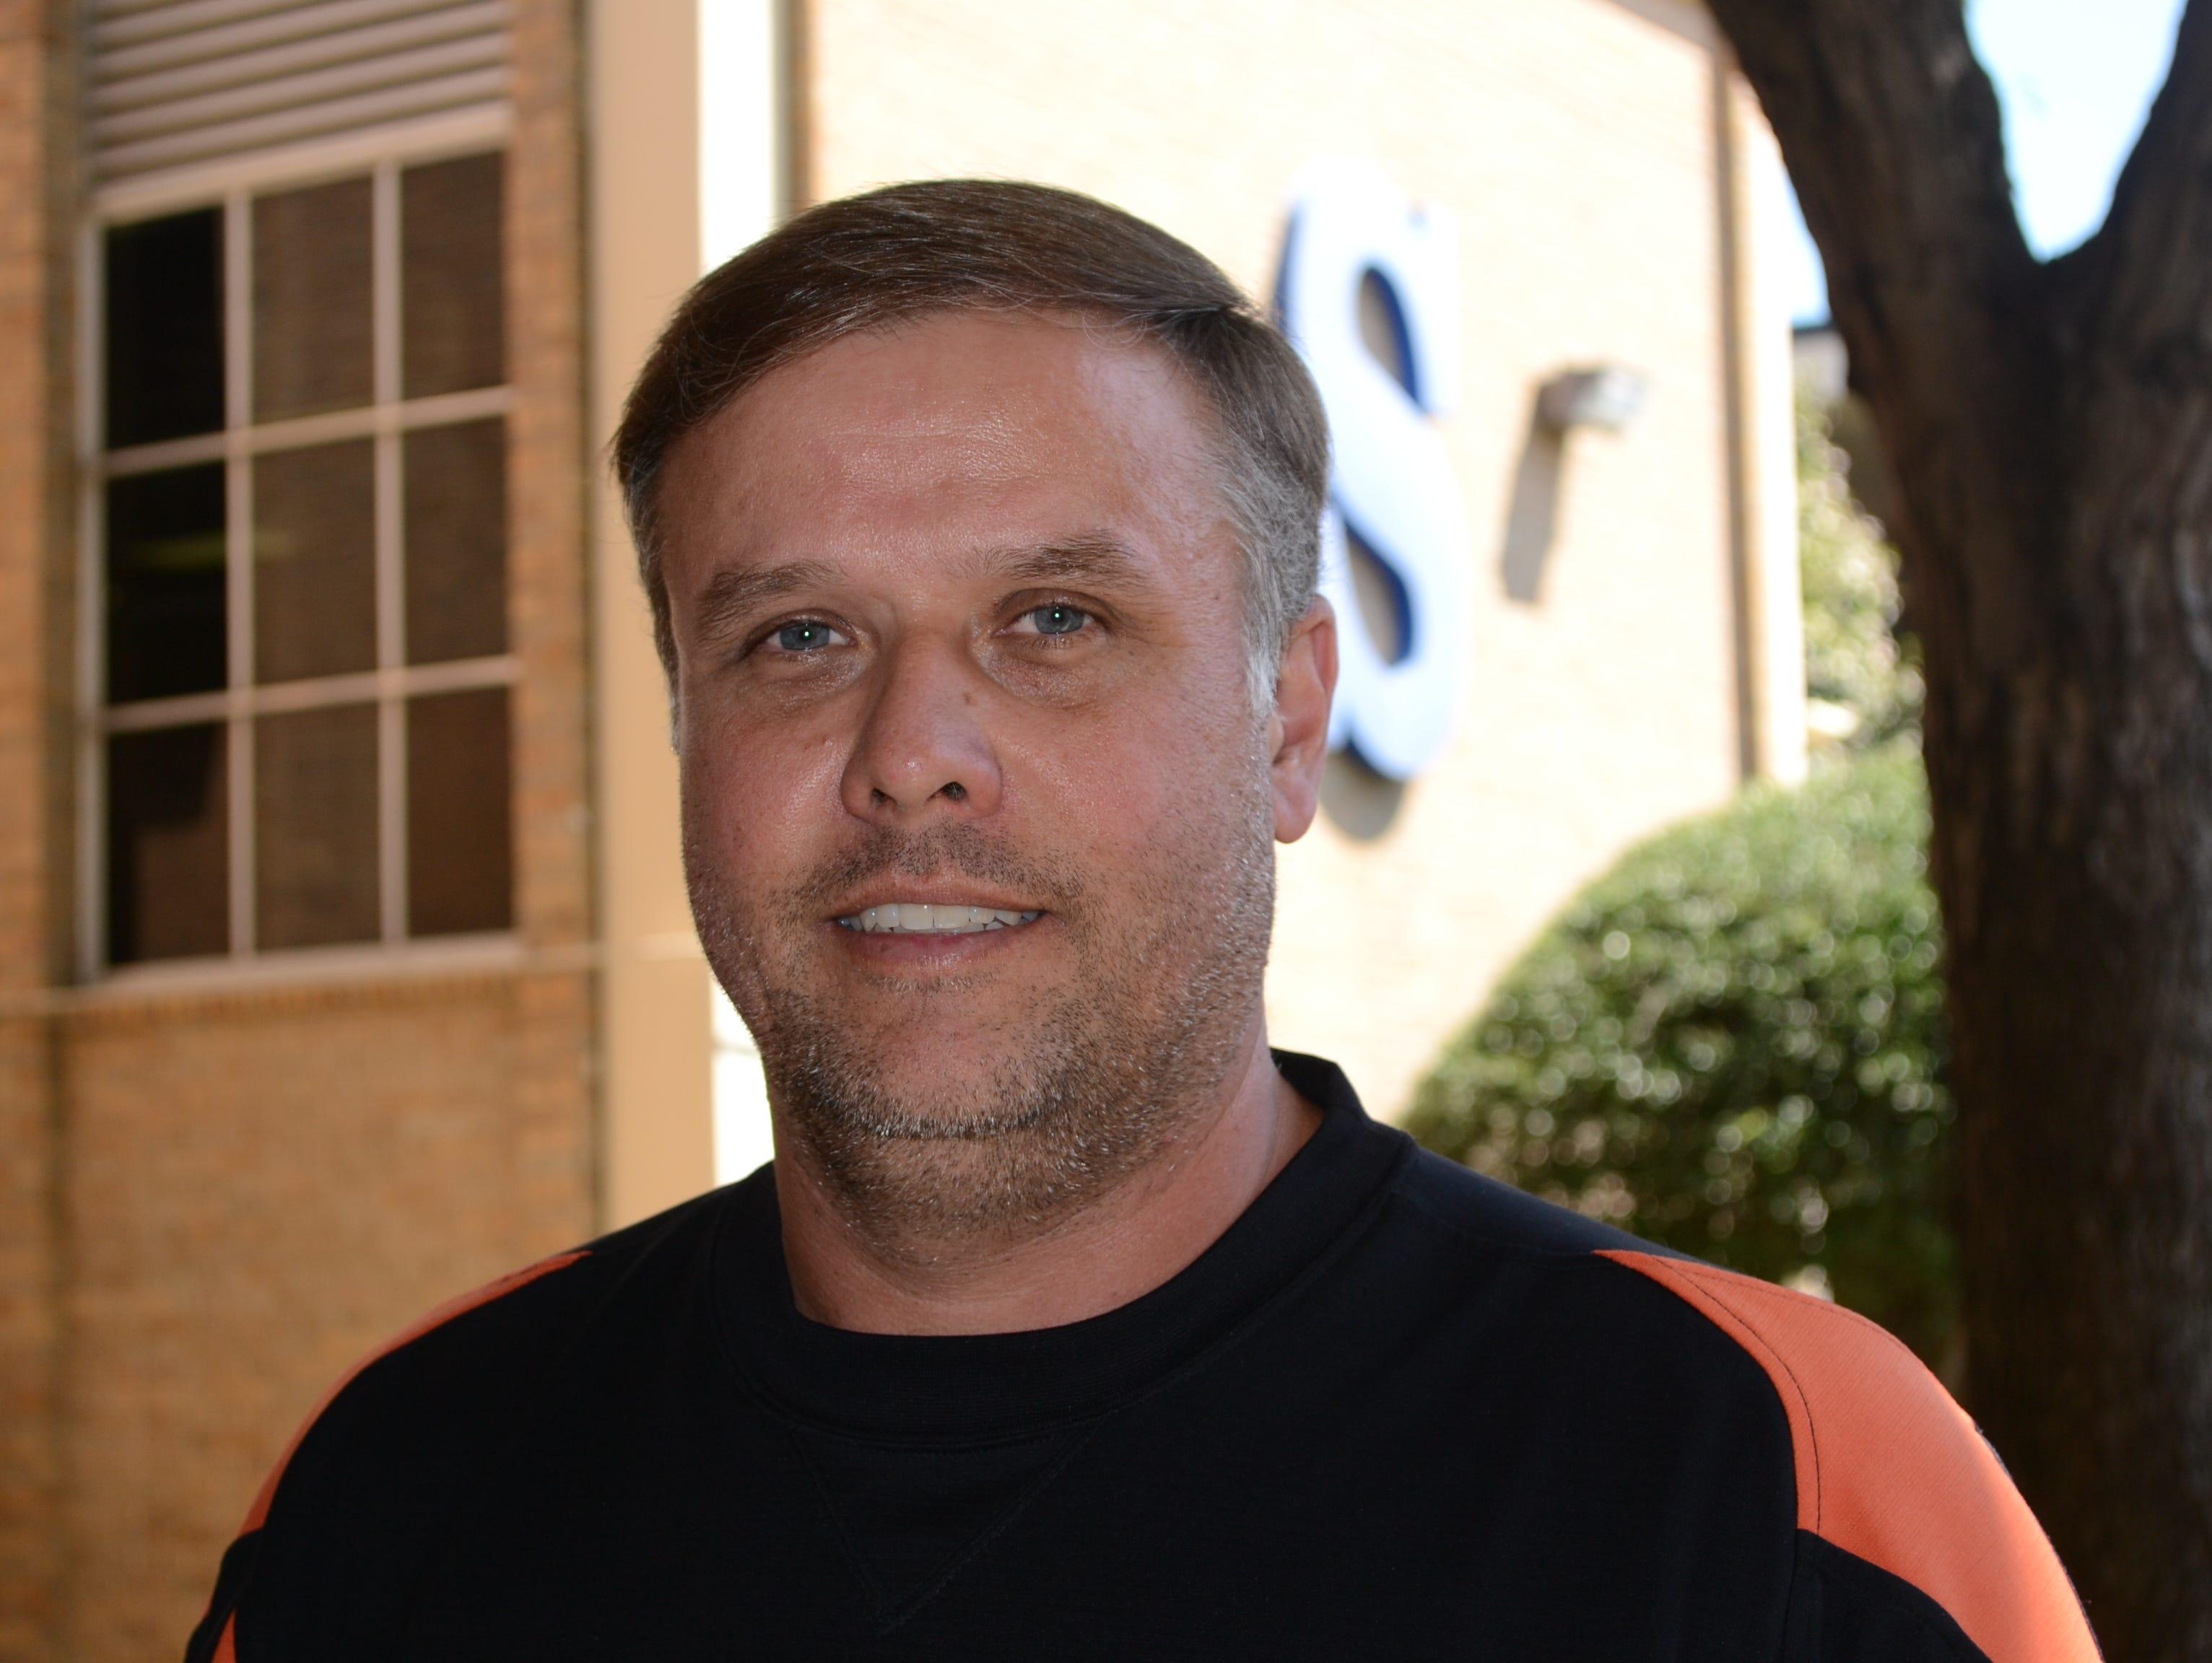 Aaron Vorachek is Southwood's new baseball coach.